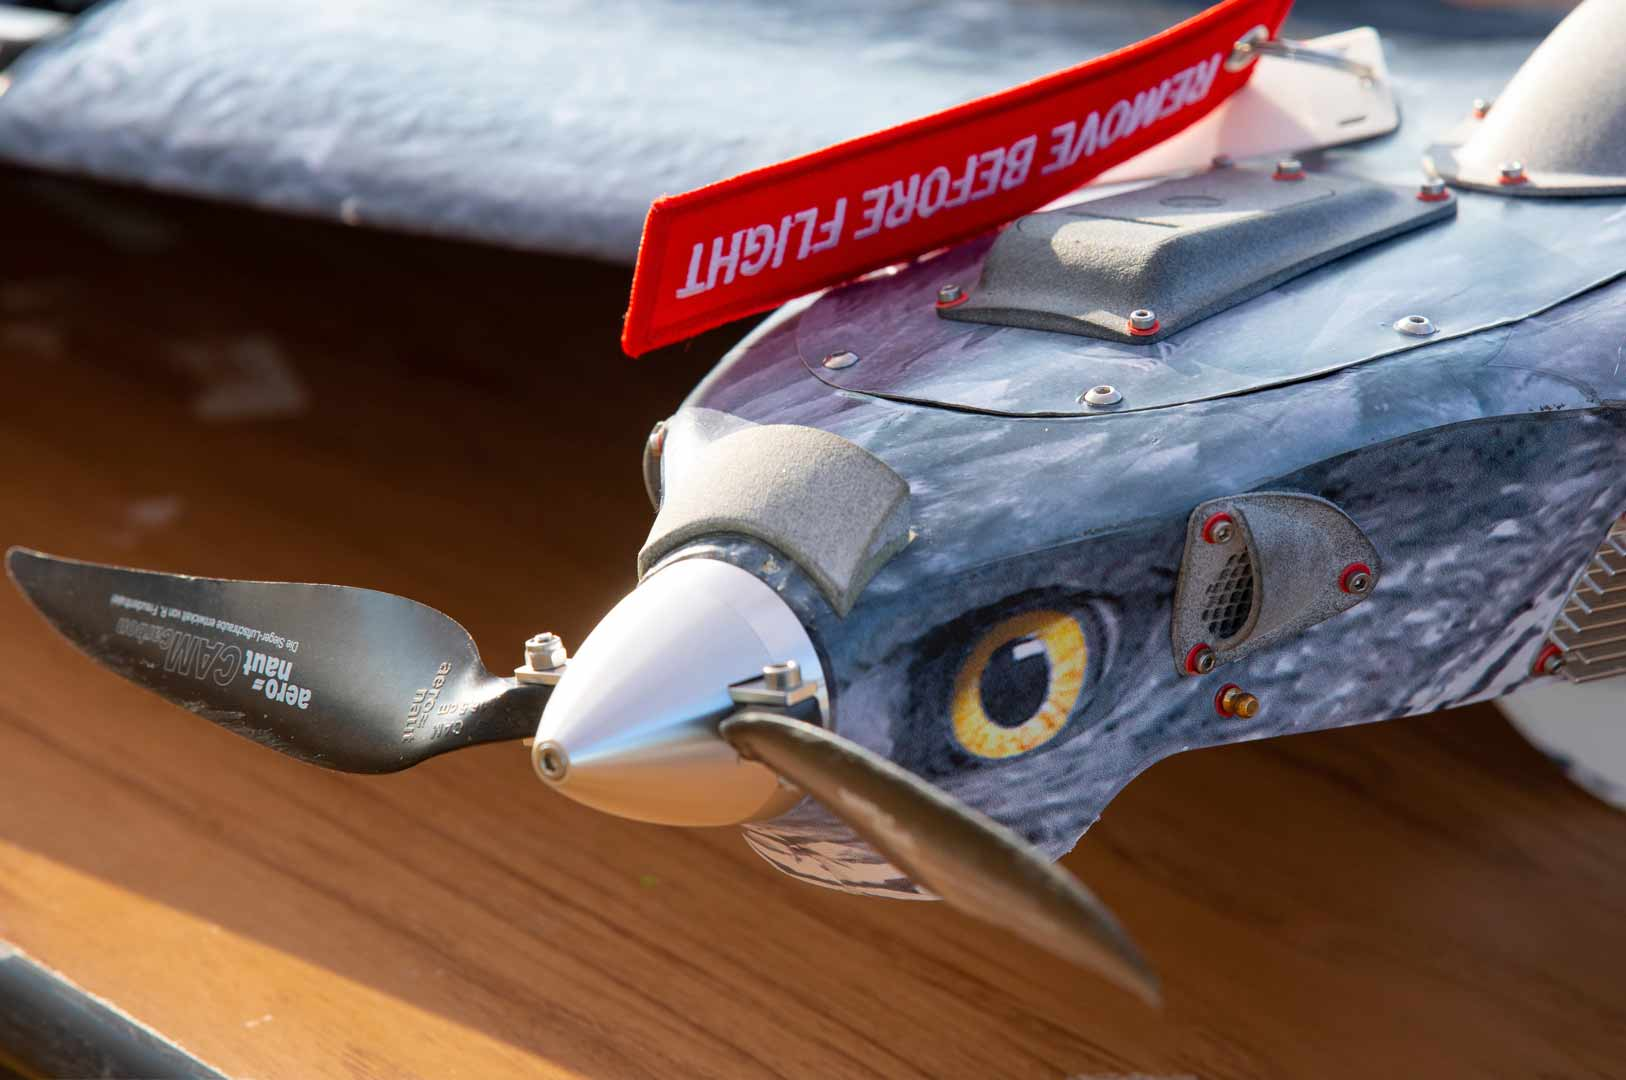 ARQUIMEA's Bird camouflage UAV SHEPHERD-MIL ADVANCED